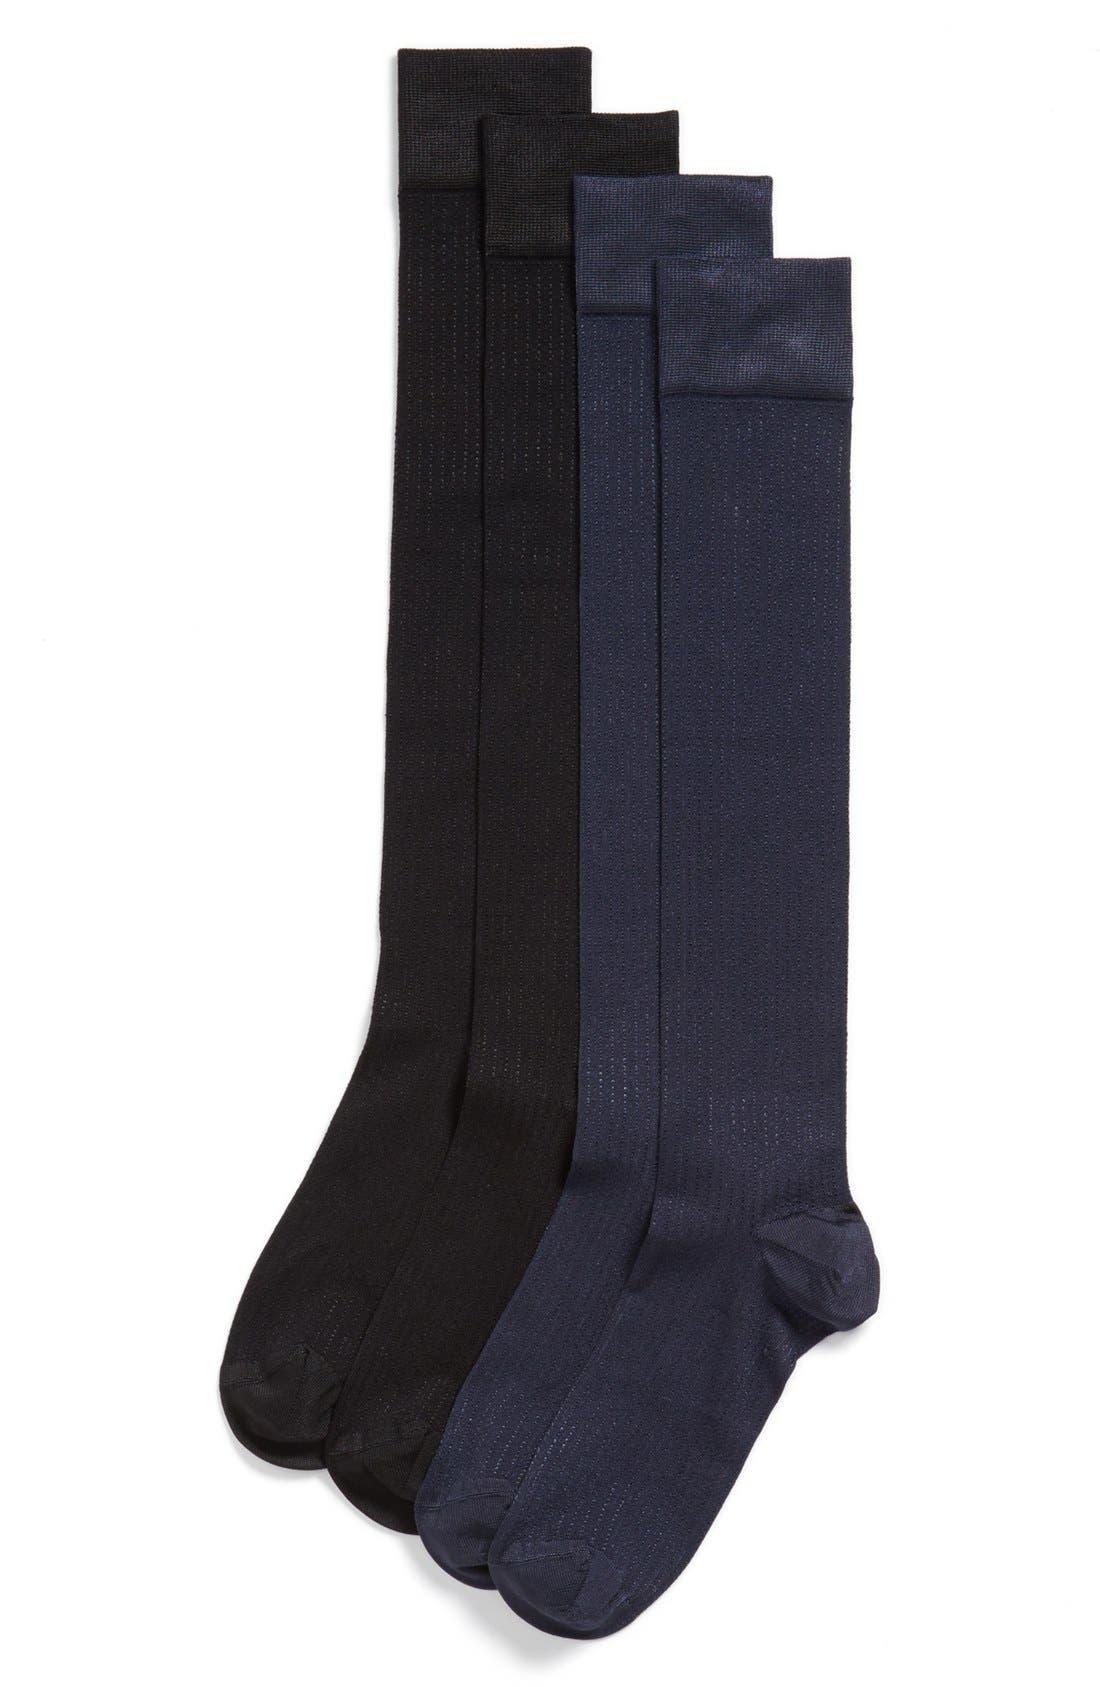 Main Image - Ralph Lauren 'Vertical Shine' Knee High Socks